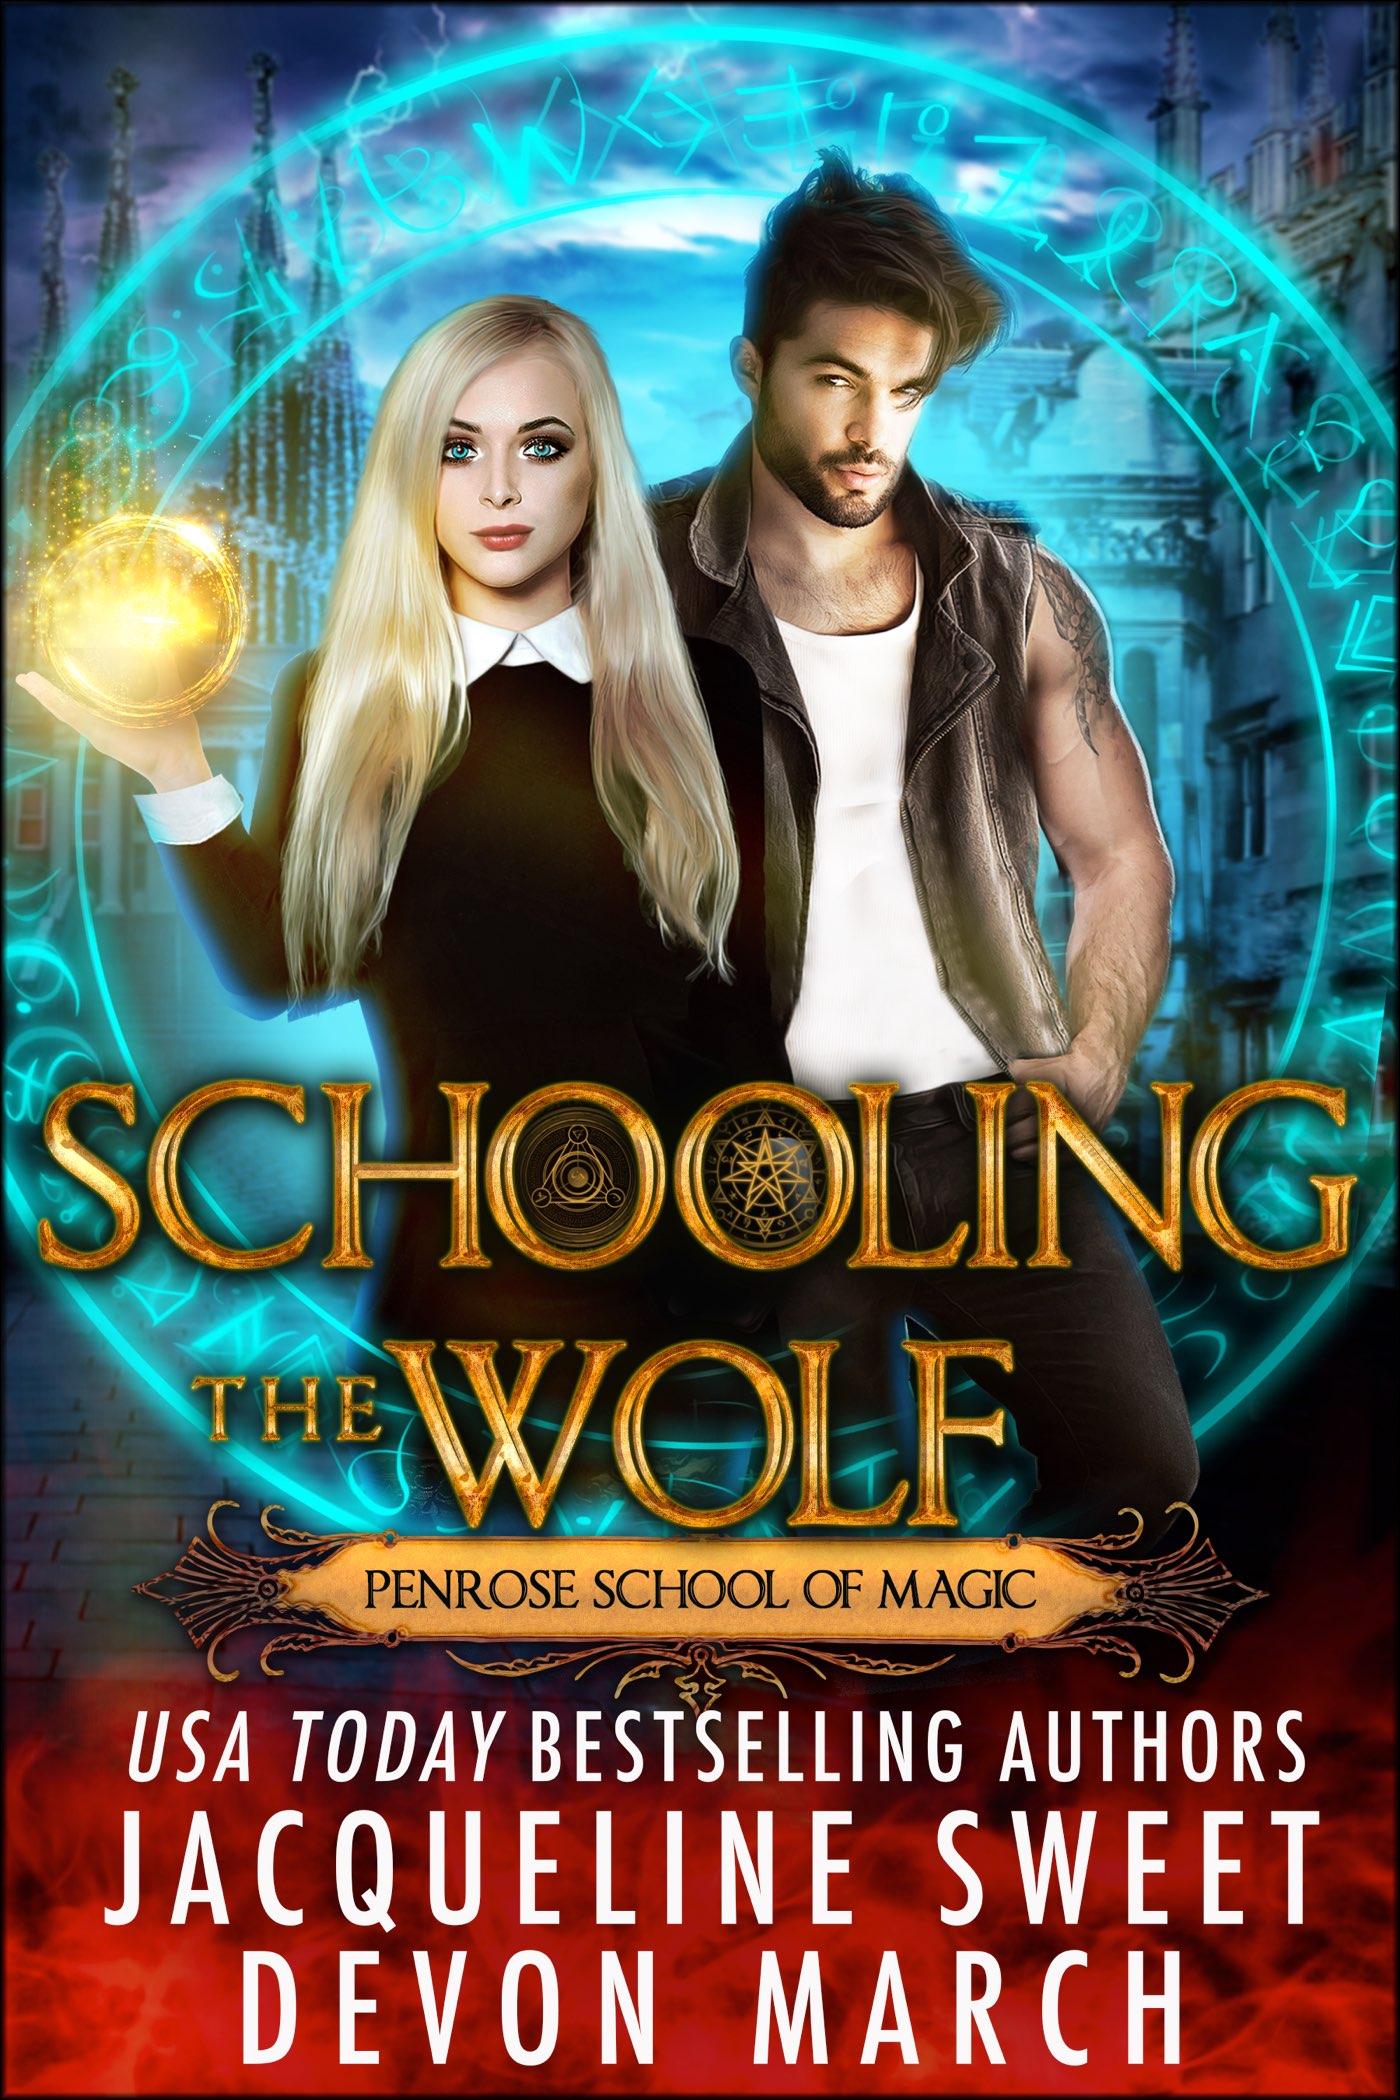 Schooling-the-Wolf-Generic.jpg